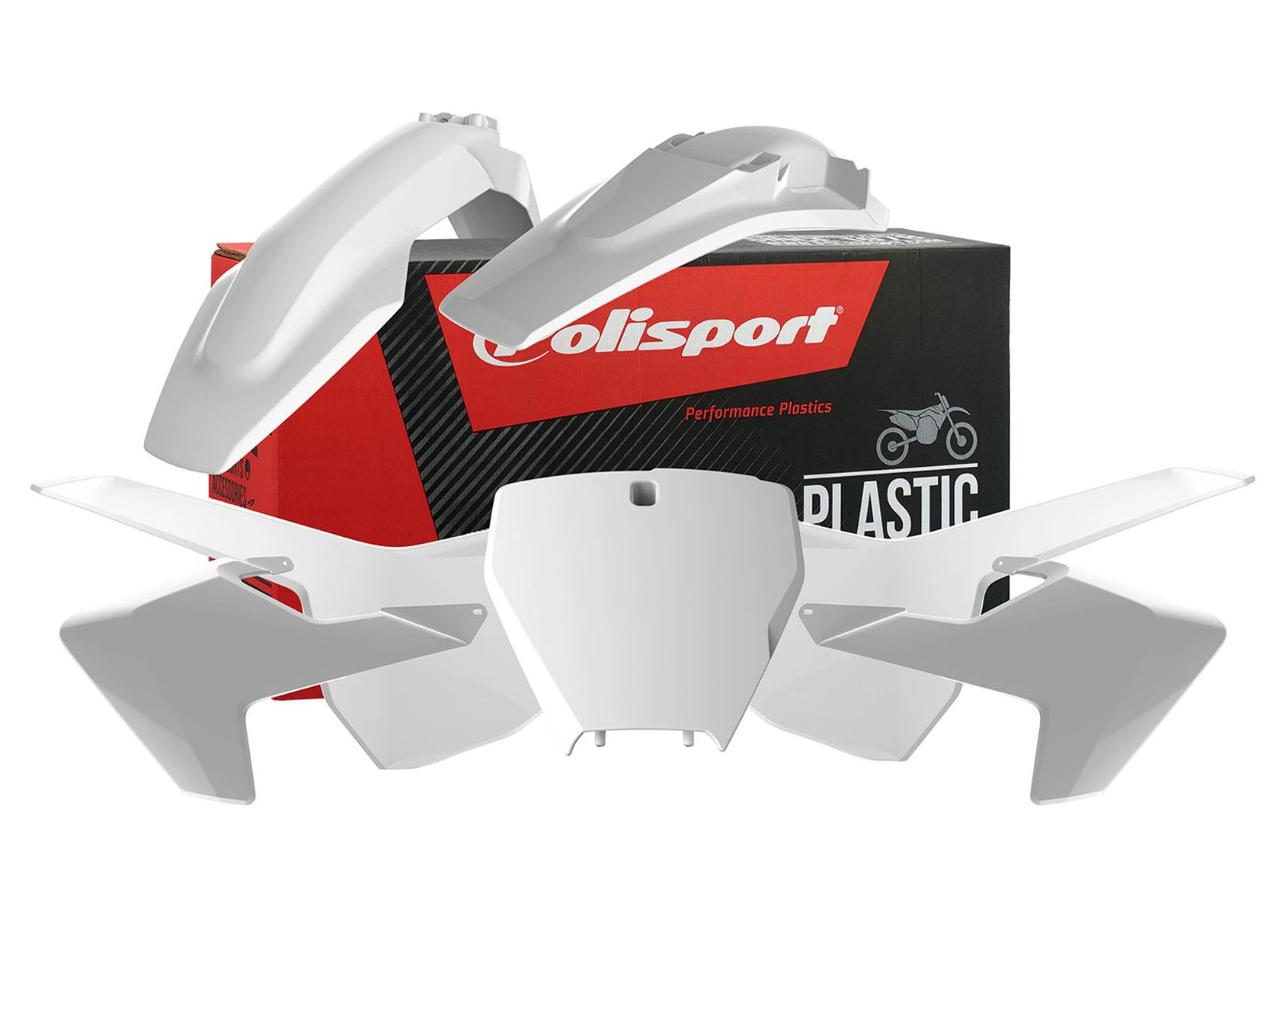 Kit Plástico Polisport Husqvarna Tc Fc 125/250/350/450 2016-2018